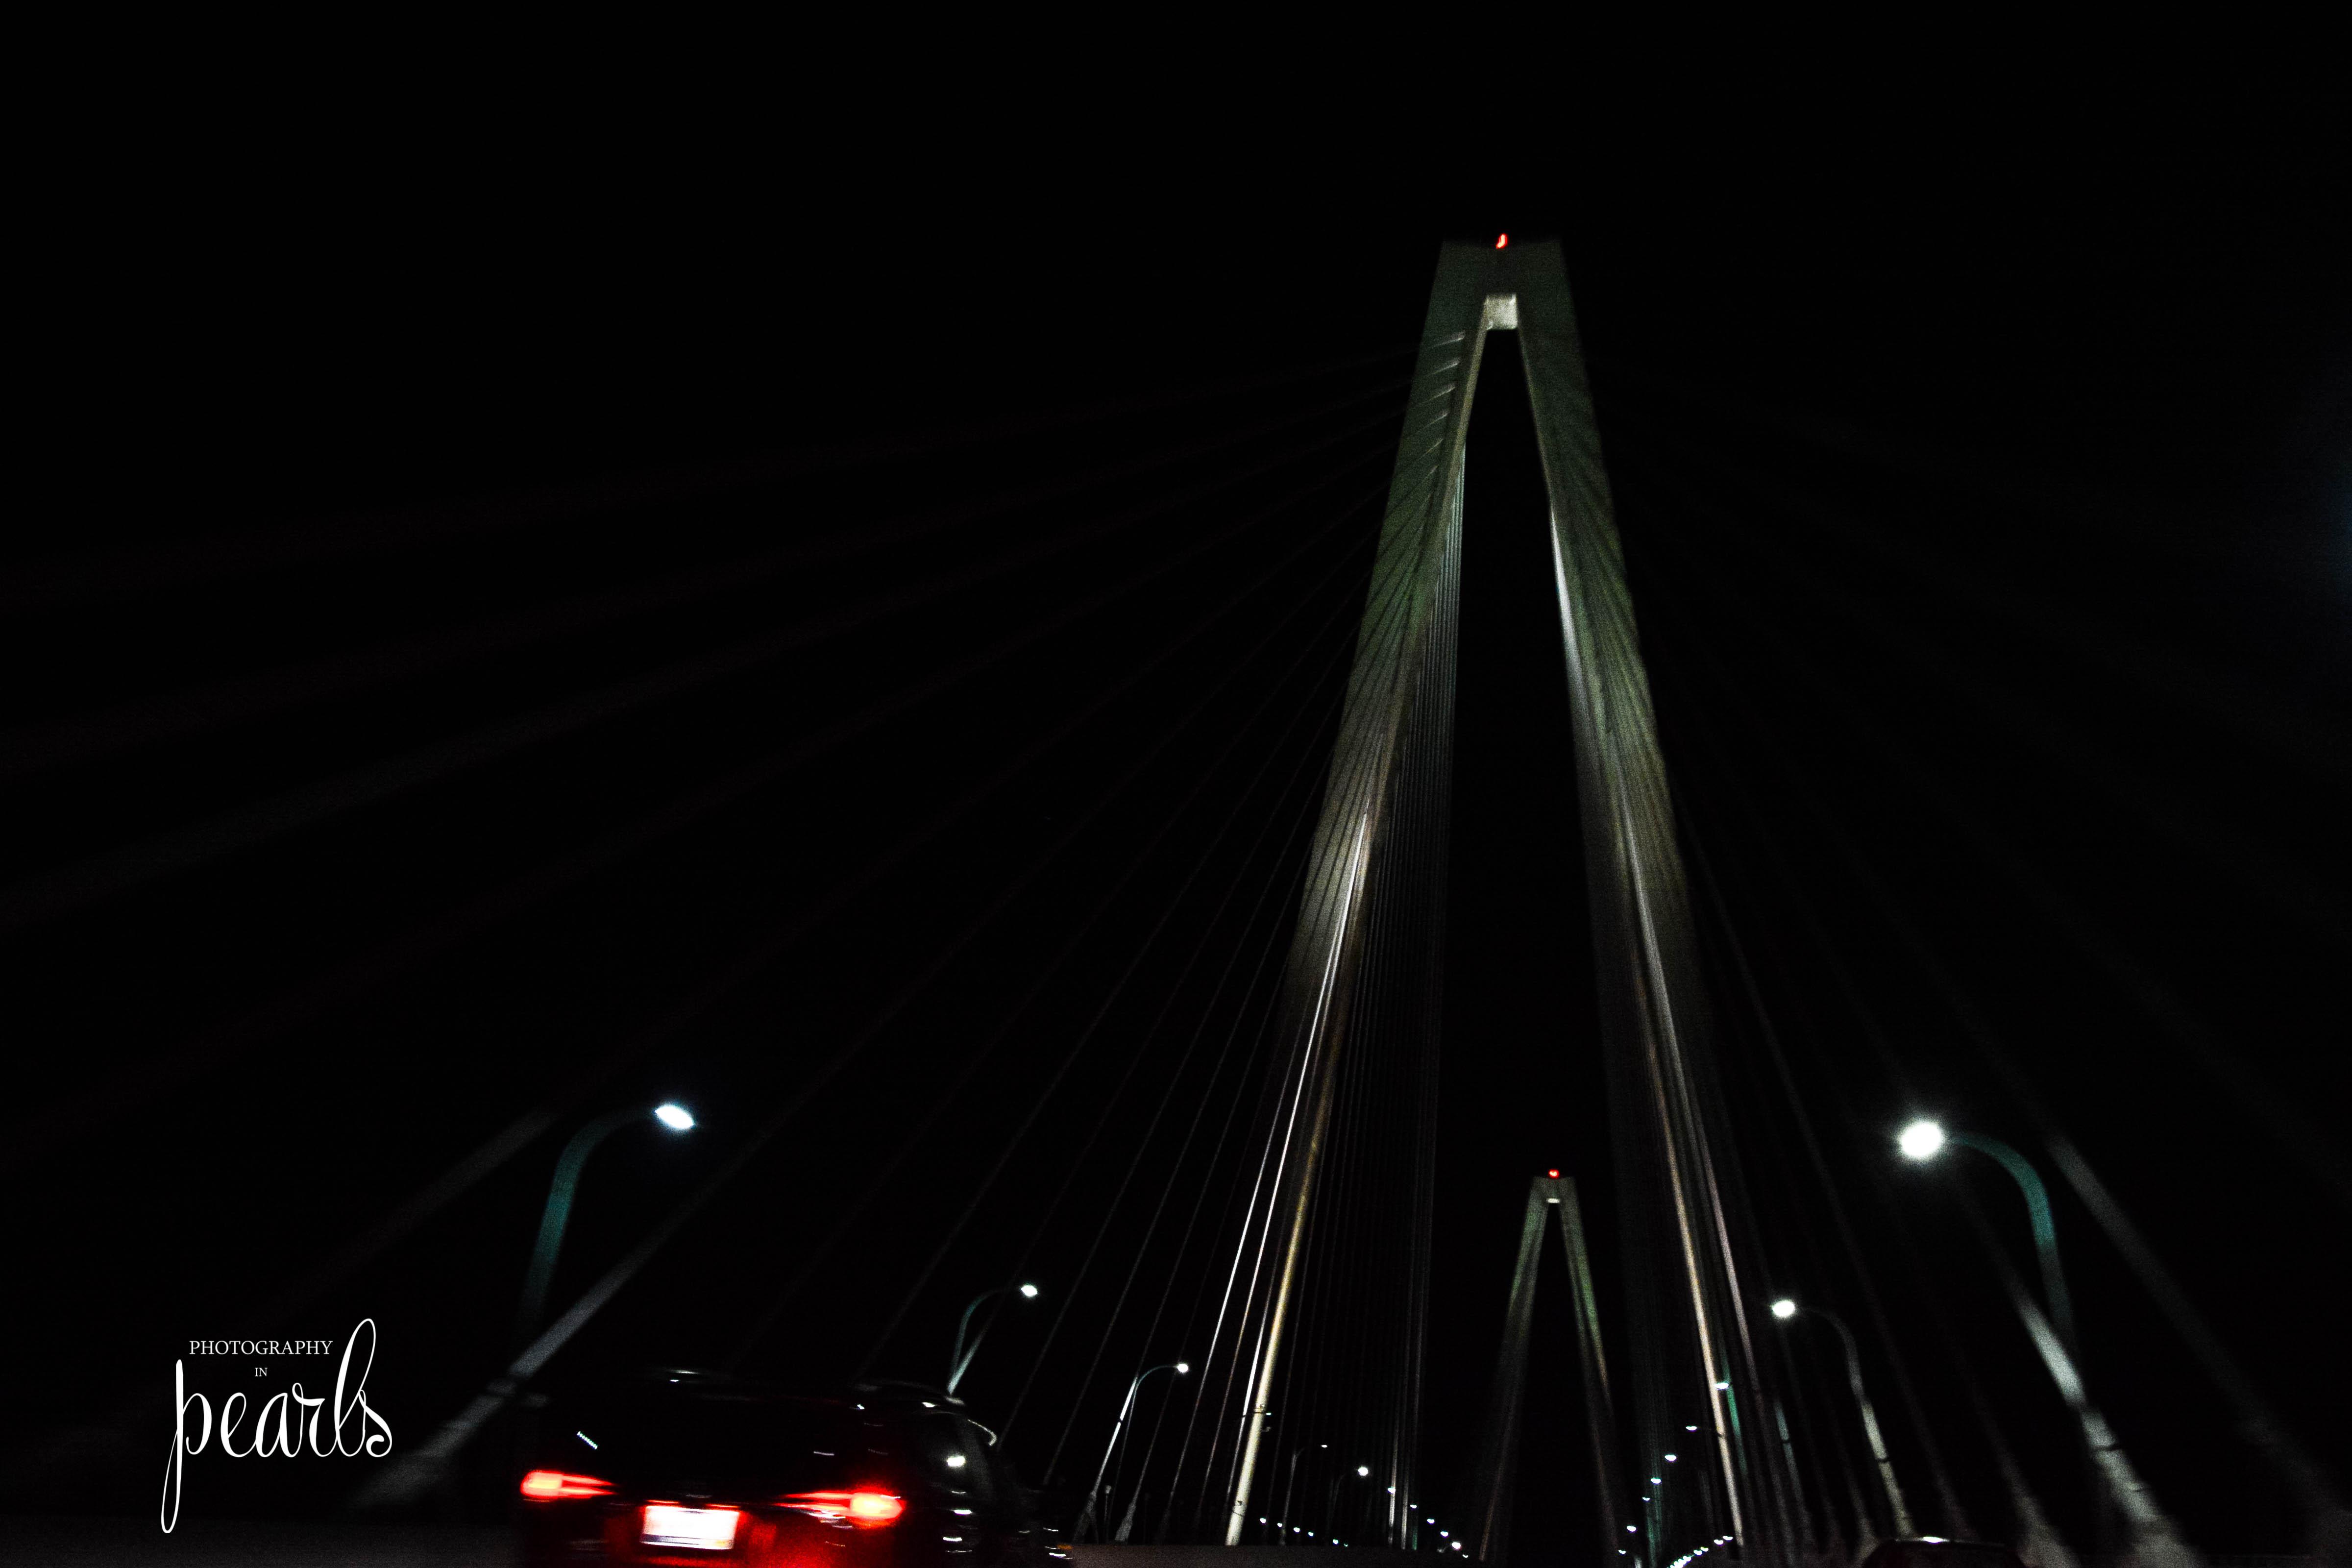 Crossing Ravenel Bridge